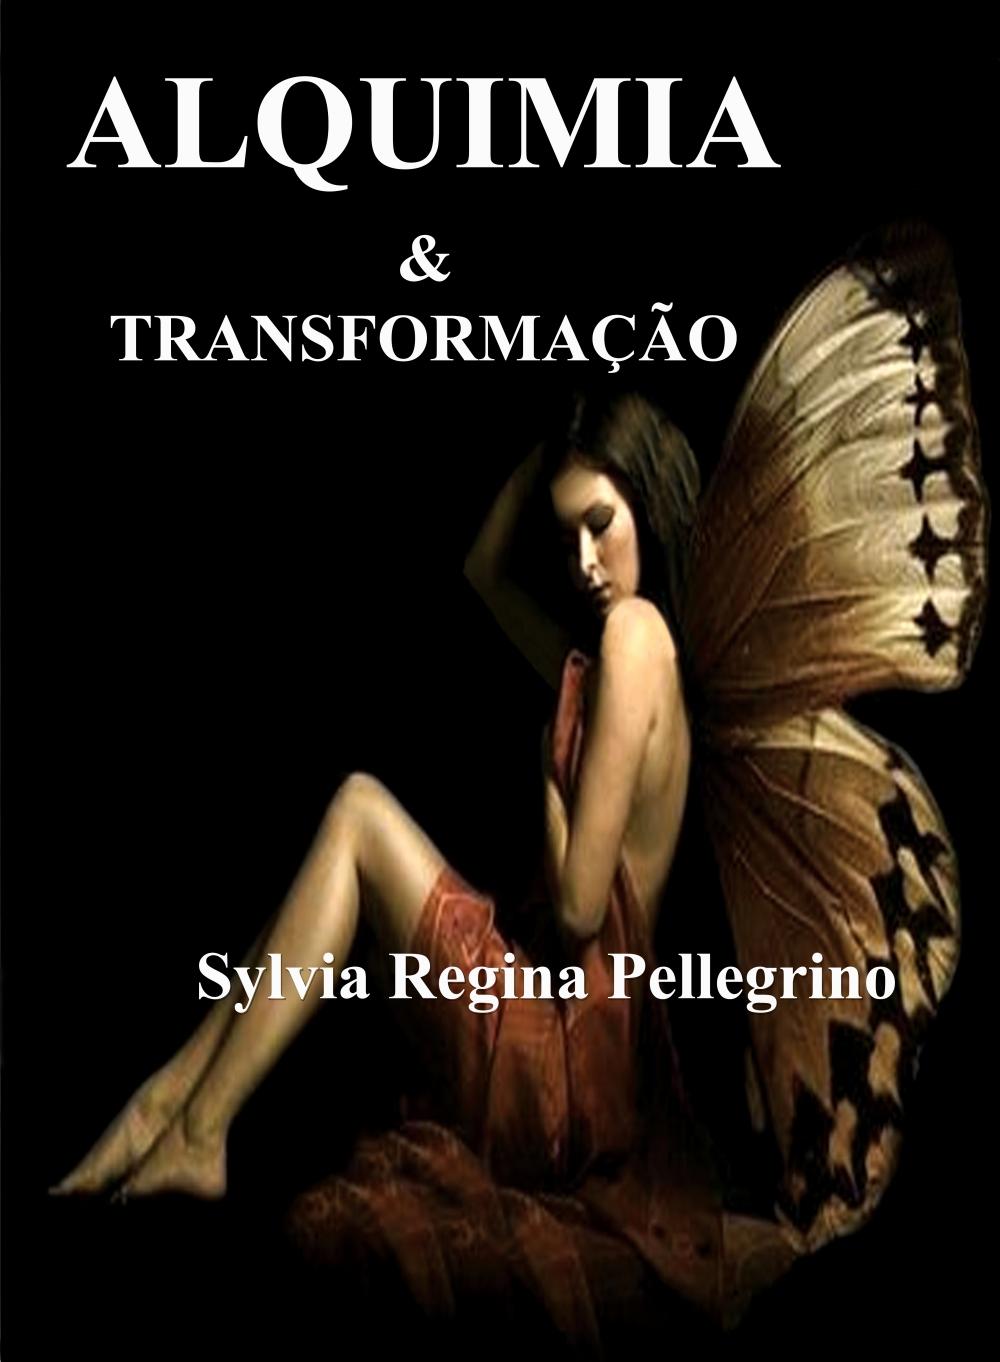 capa Alquimia e Transformacao para e-book.jpg